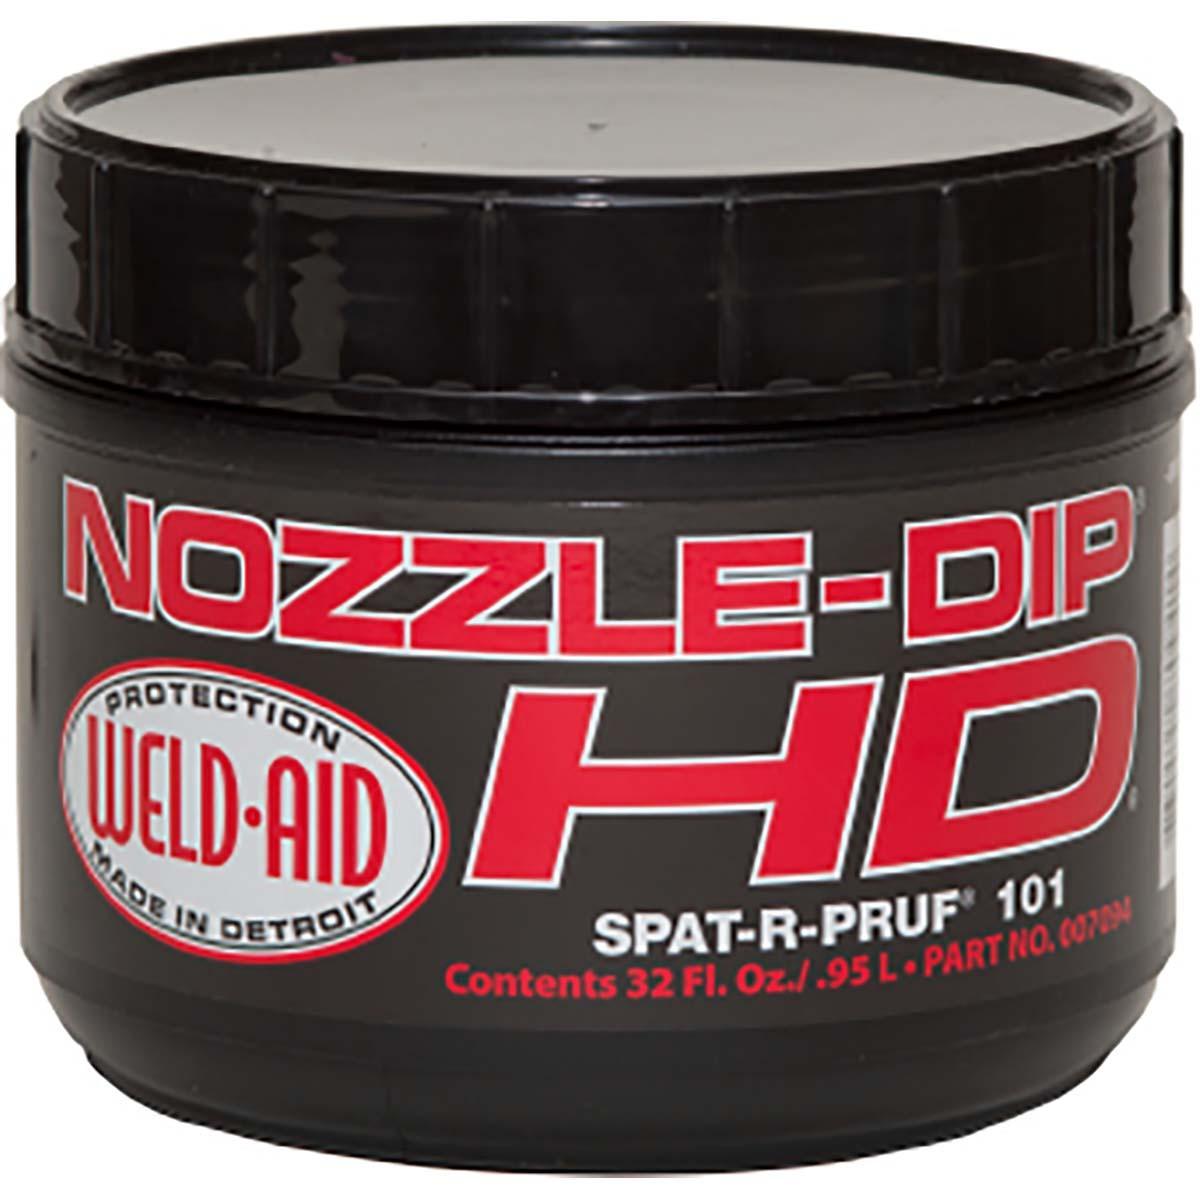 HD (Heavy Duty) Nozzle Dip Gel   32oz/.95 L